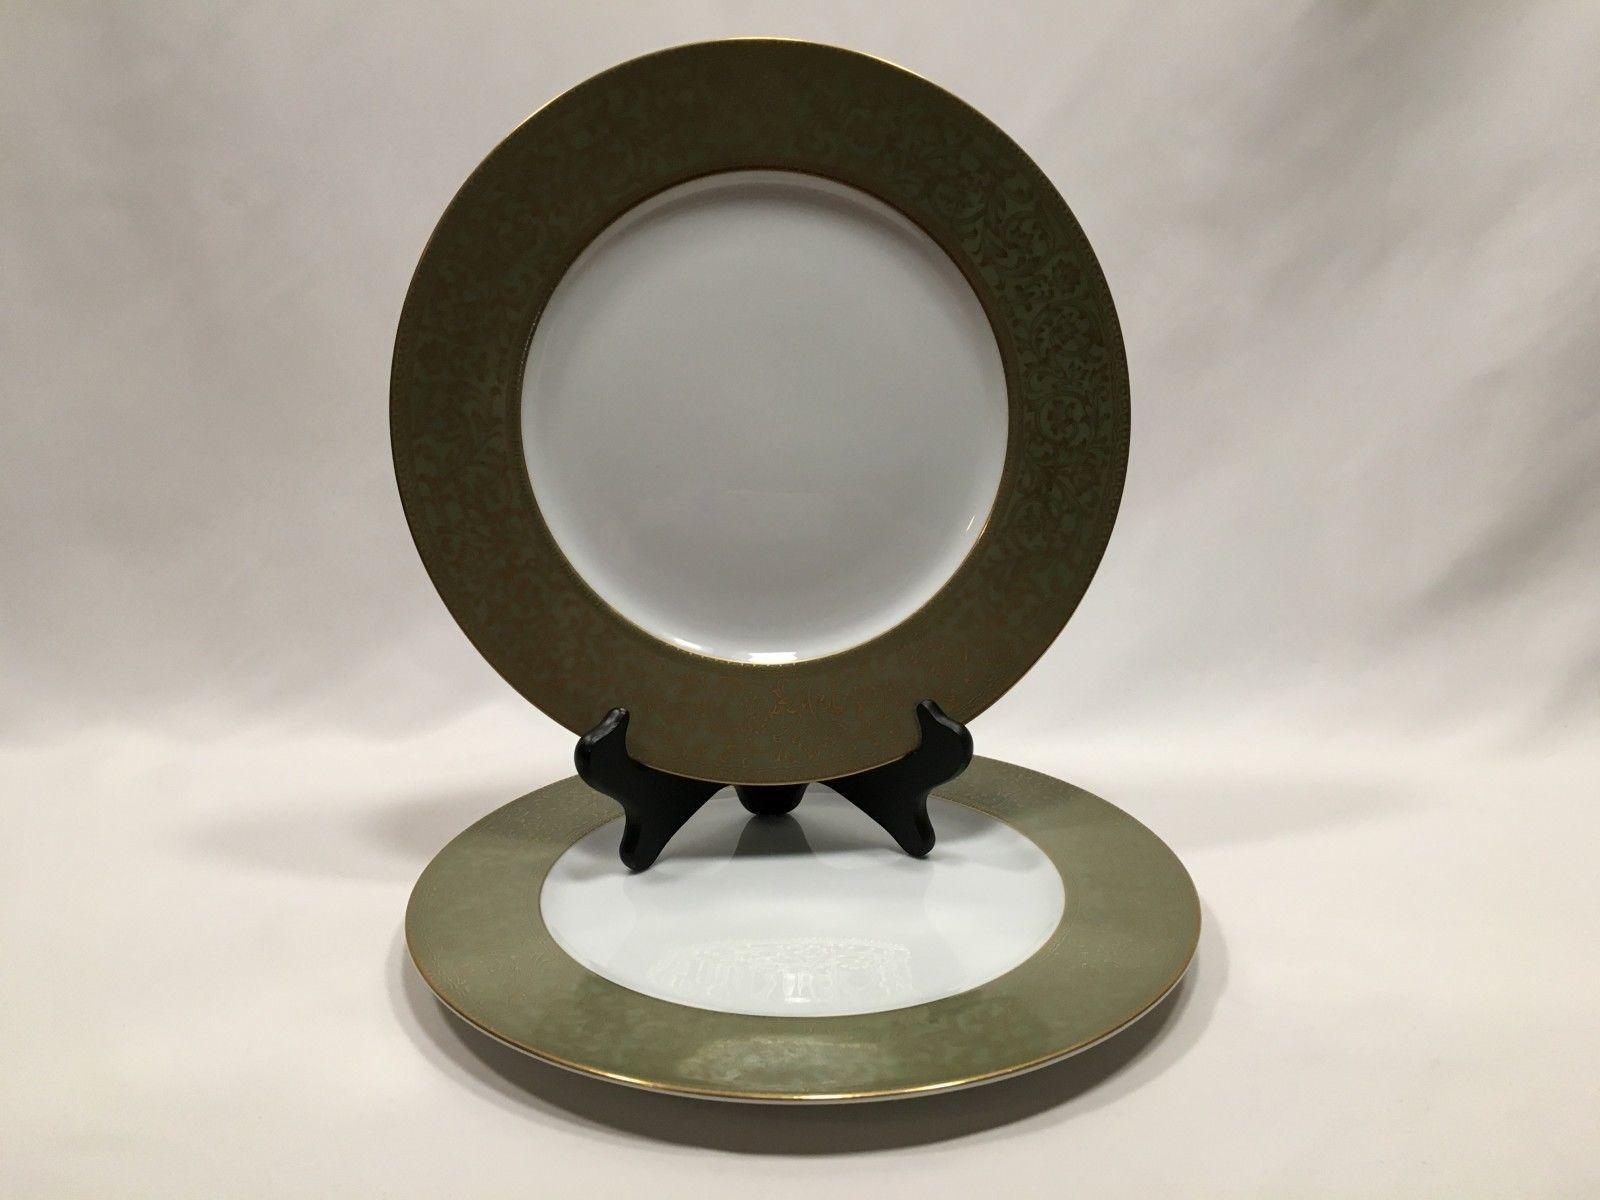 Sango Versailles Dinner Plates White Green Gold Filigree Trim 3632 Japan 10 3... - $24.99